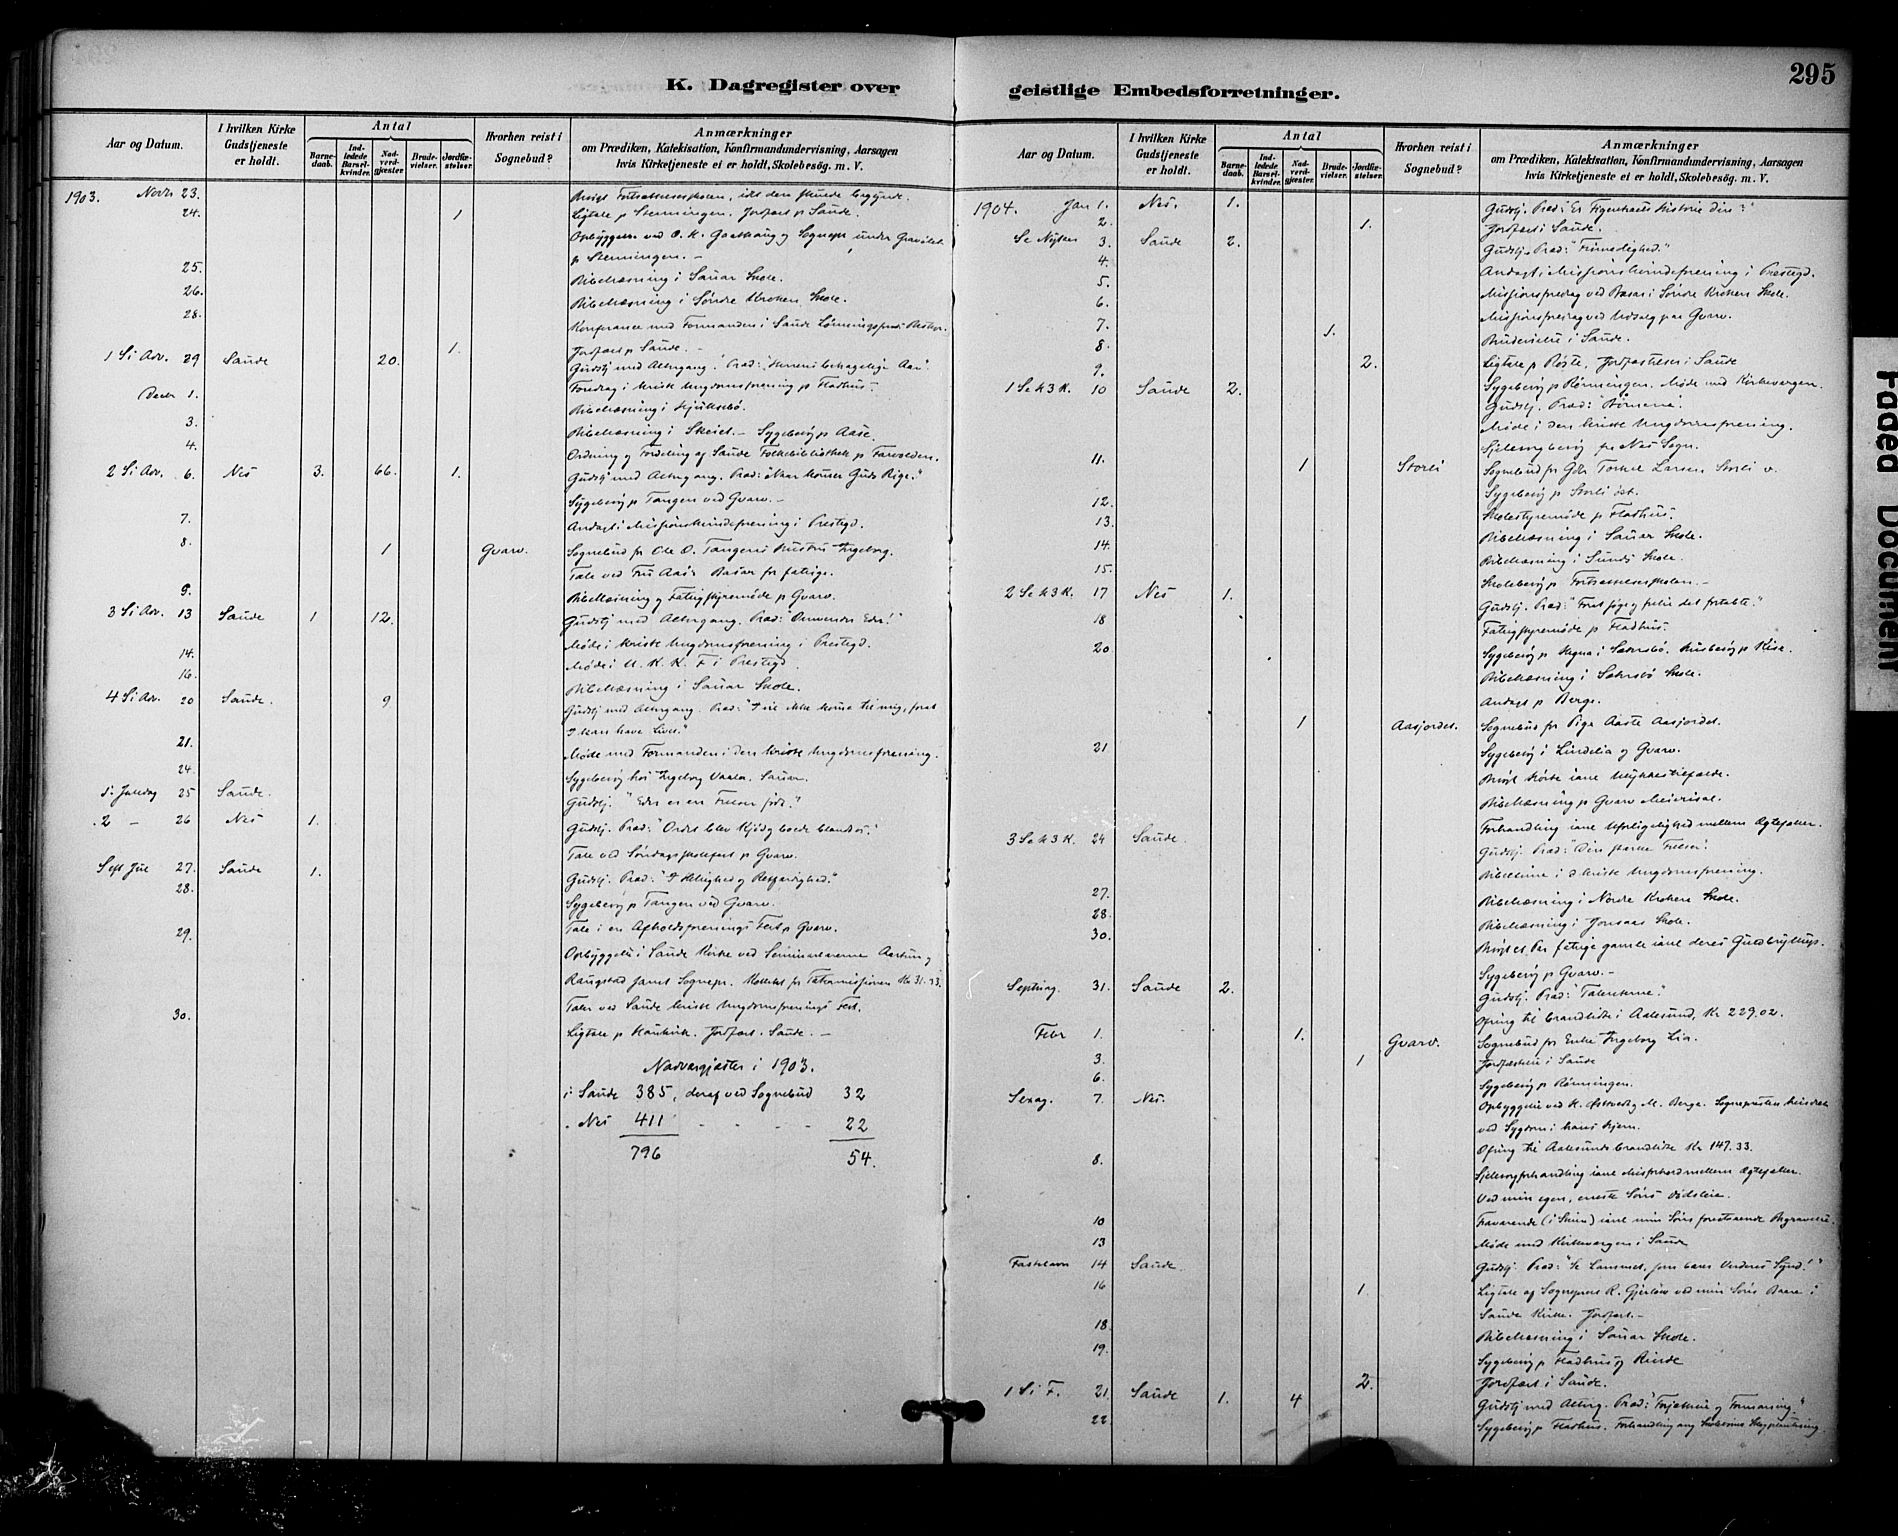 SAKO, Sauherad kirkebøker, F/Fa/L0009: Ministerialbok nr. I 9, 1887-1912, s. 295